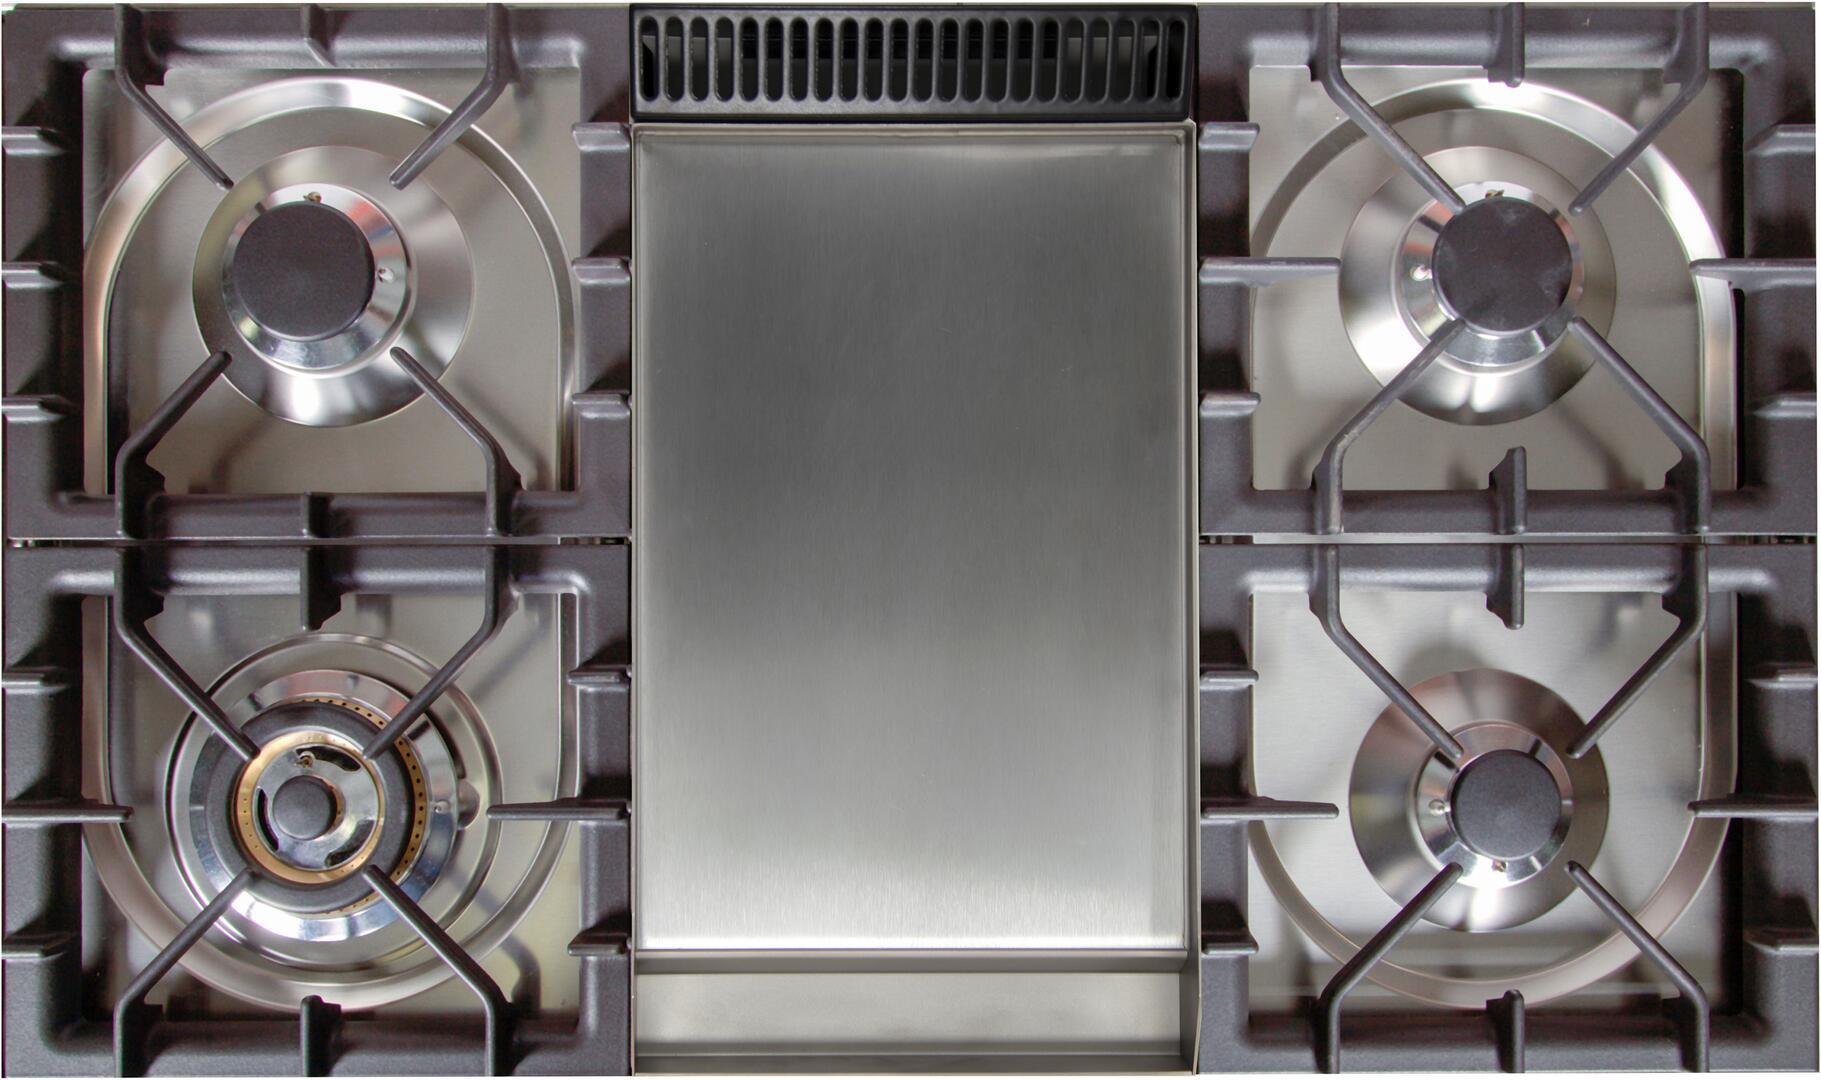 Ilve Nostalgie UPDN100FDMPNLP Freestanding Dual Fuel Range Black, Cooktop